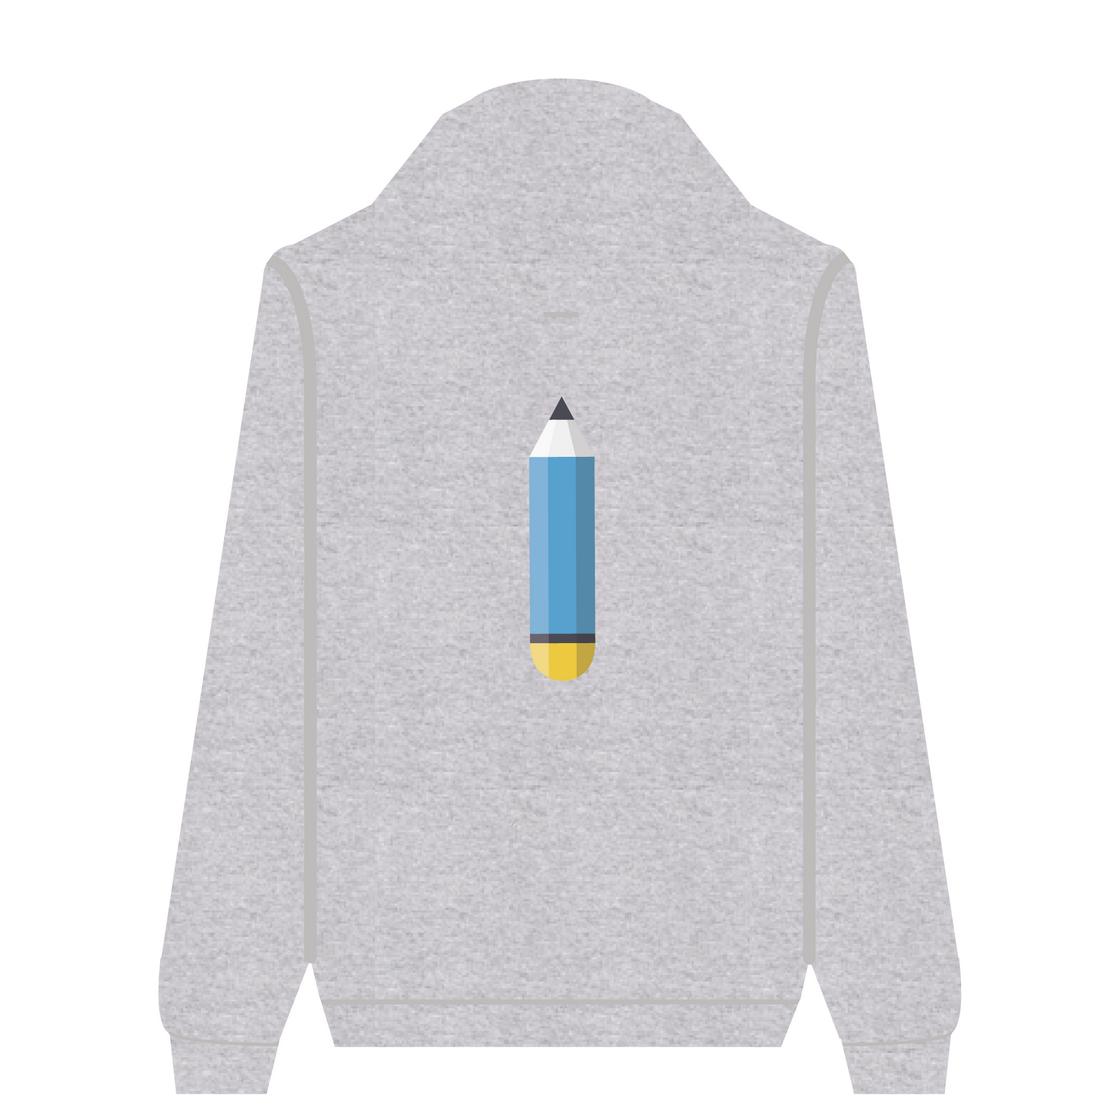 Full Zip Hoodie Pencil | Wuzzee